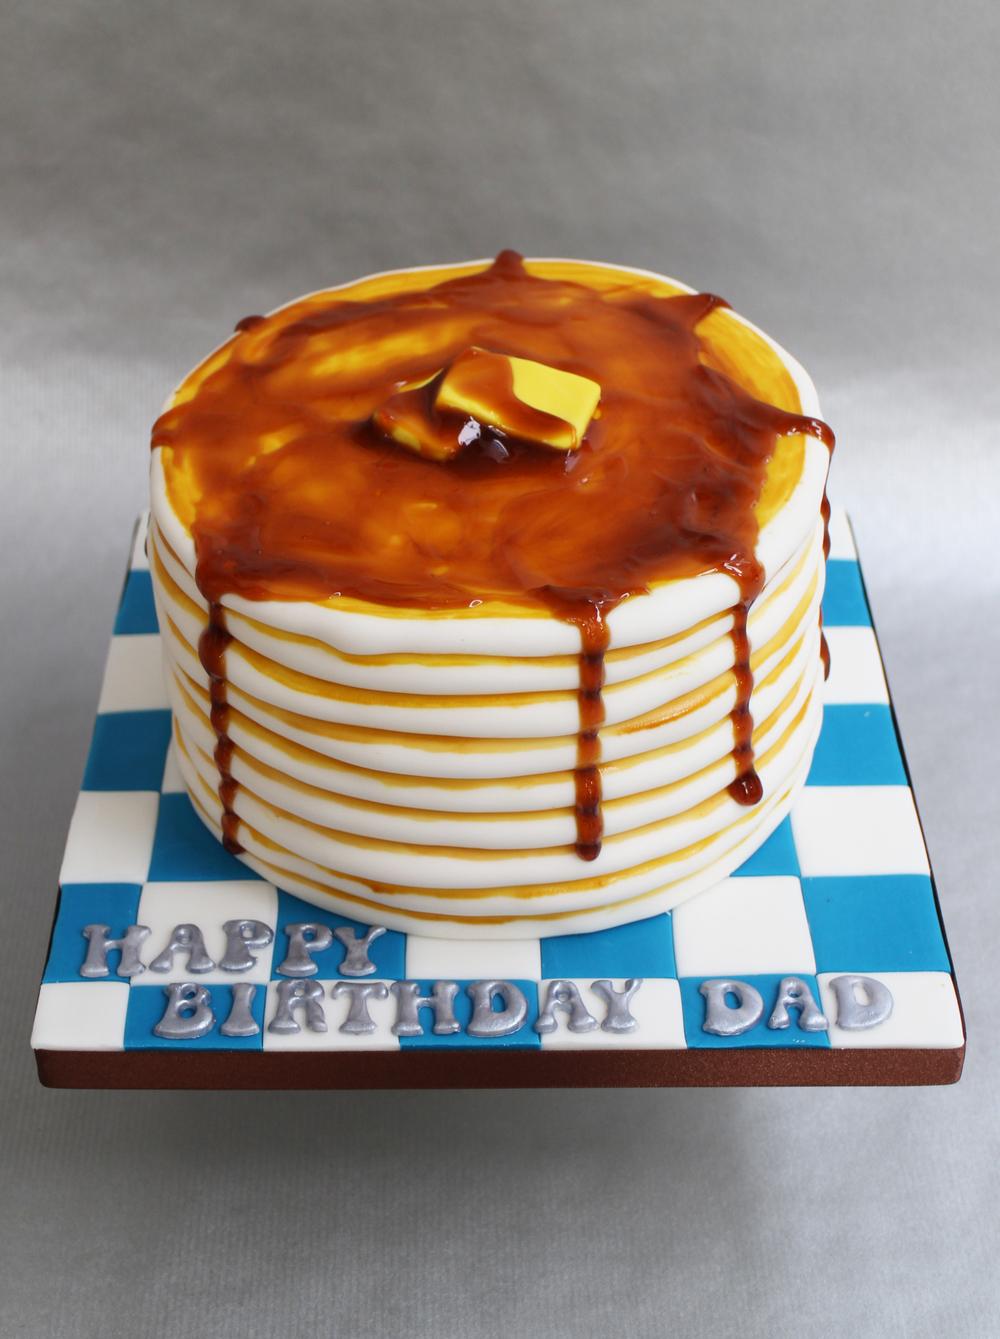 Pancake Birthday Cake.jpg